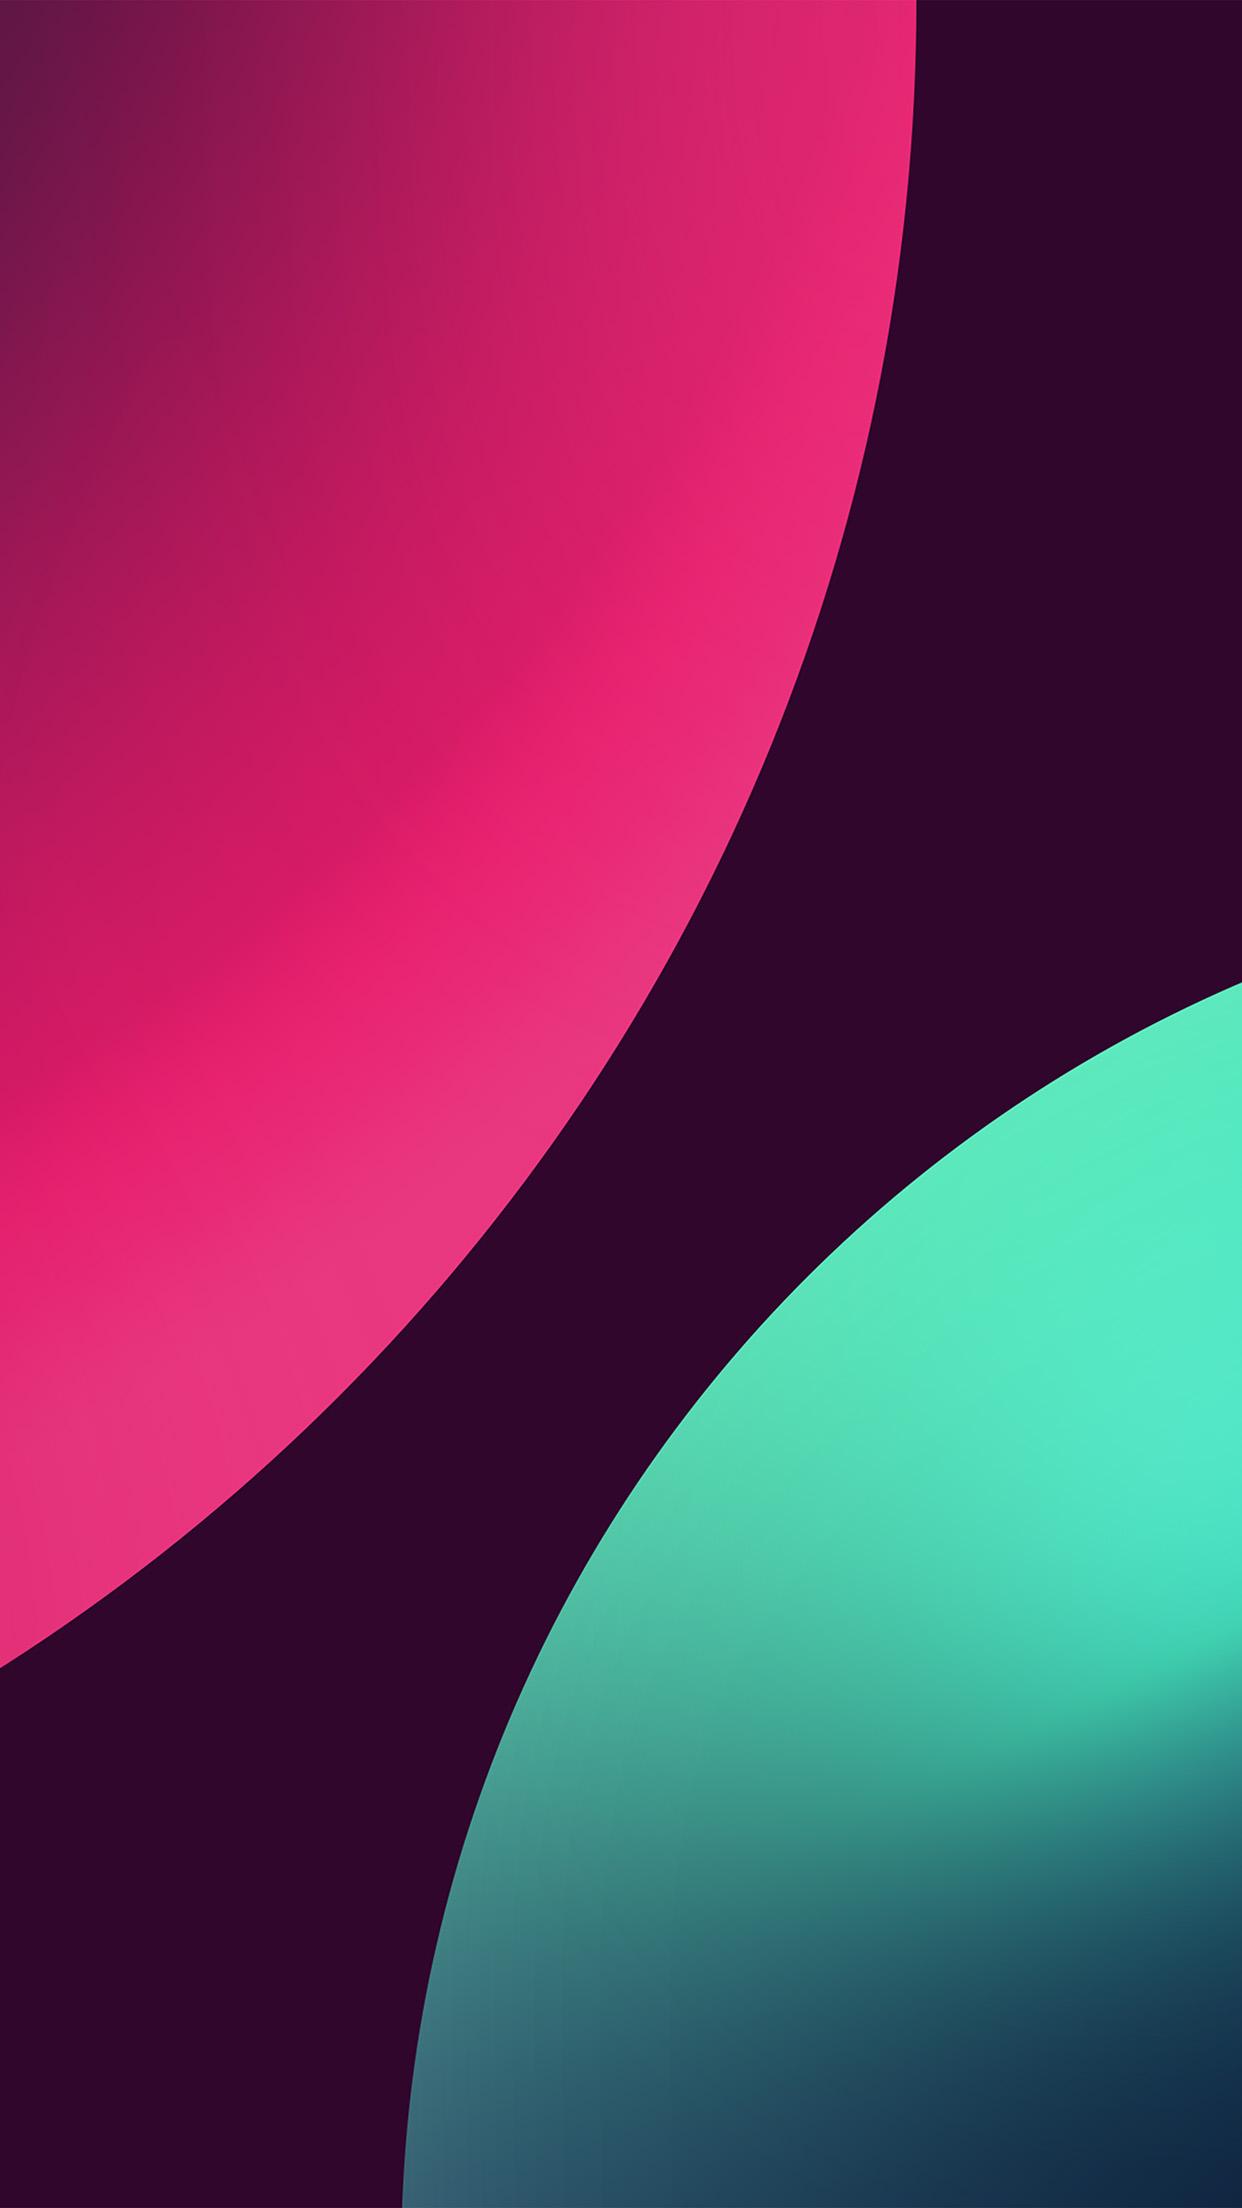 Cute Pink Wallpaper For Iphone 6 Plus Bd87 Minimal Circle Red Green Art Illustration Wallpaper